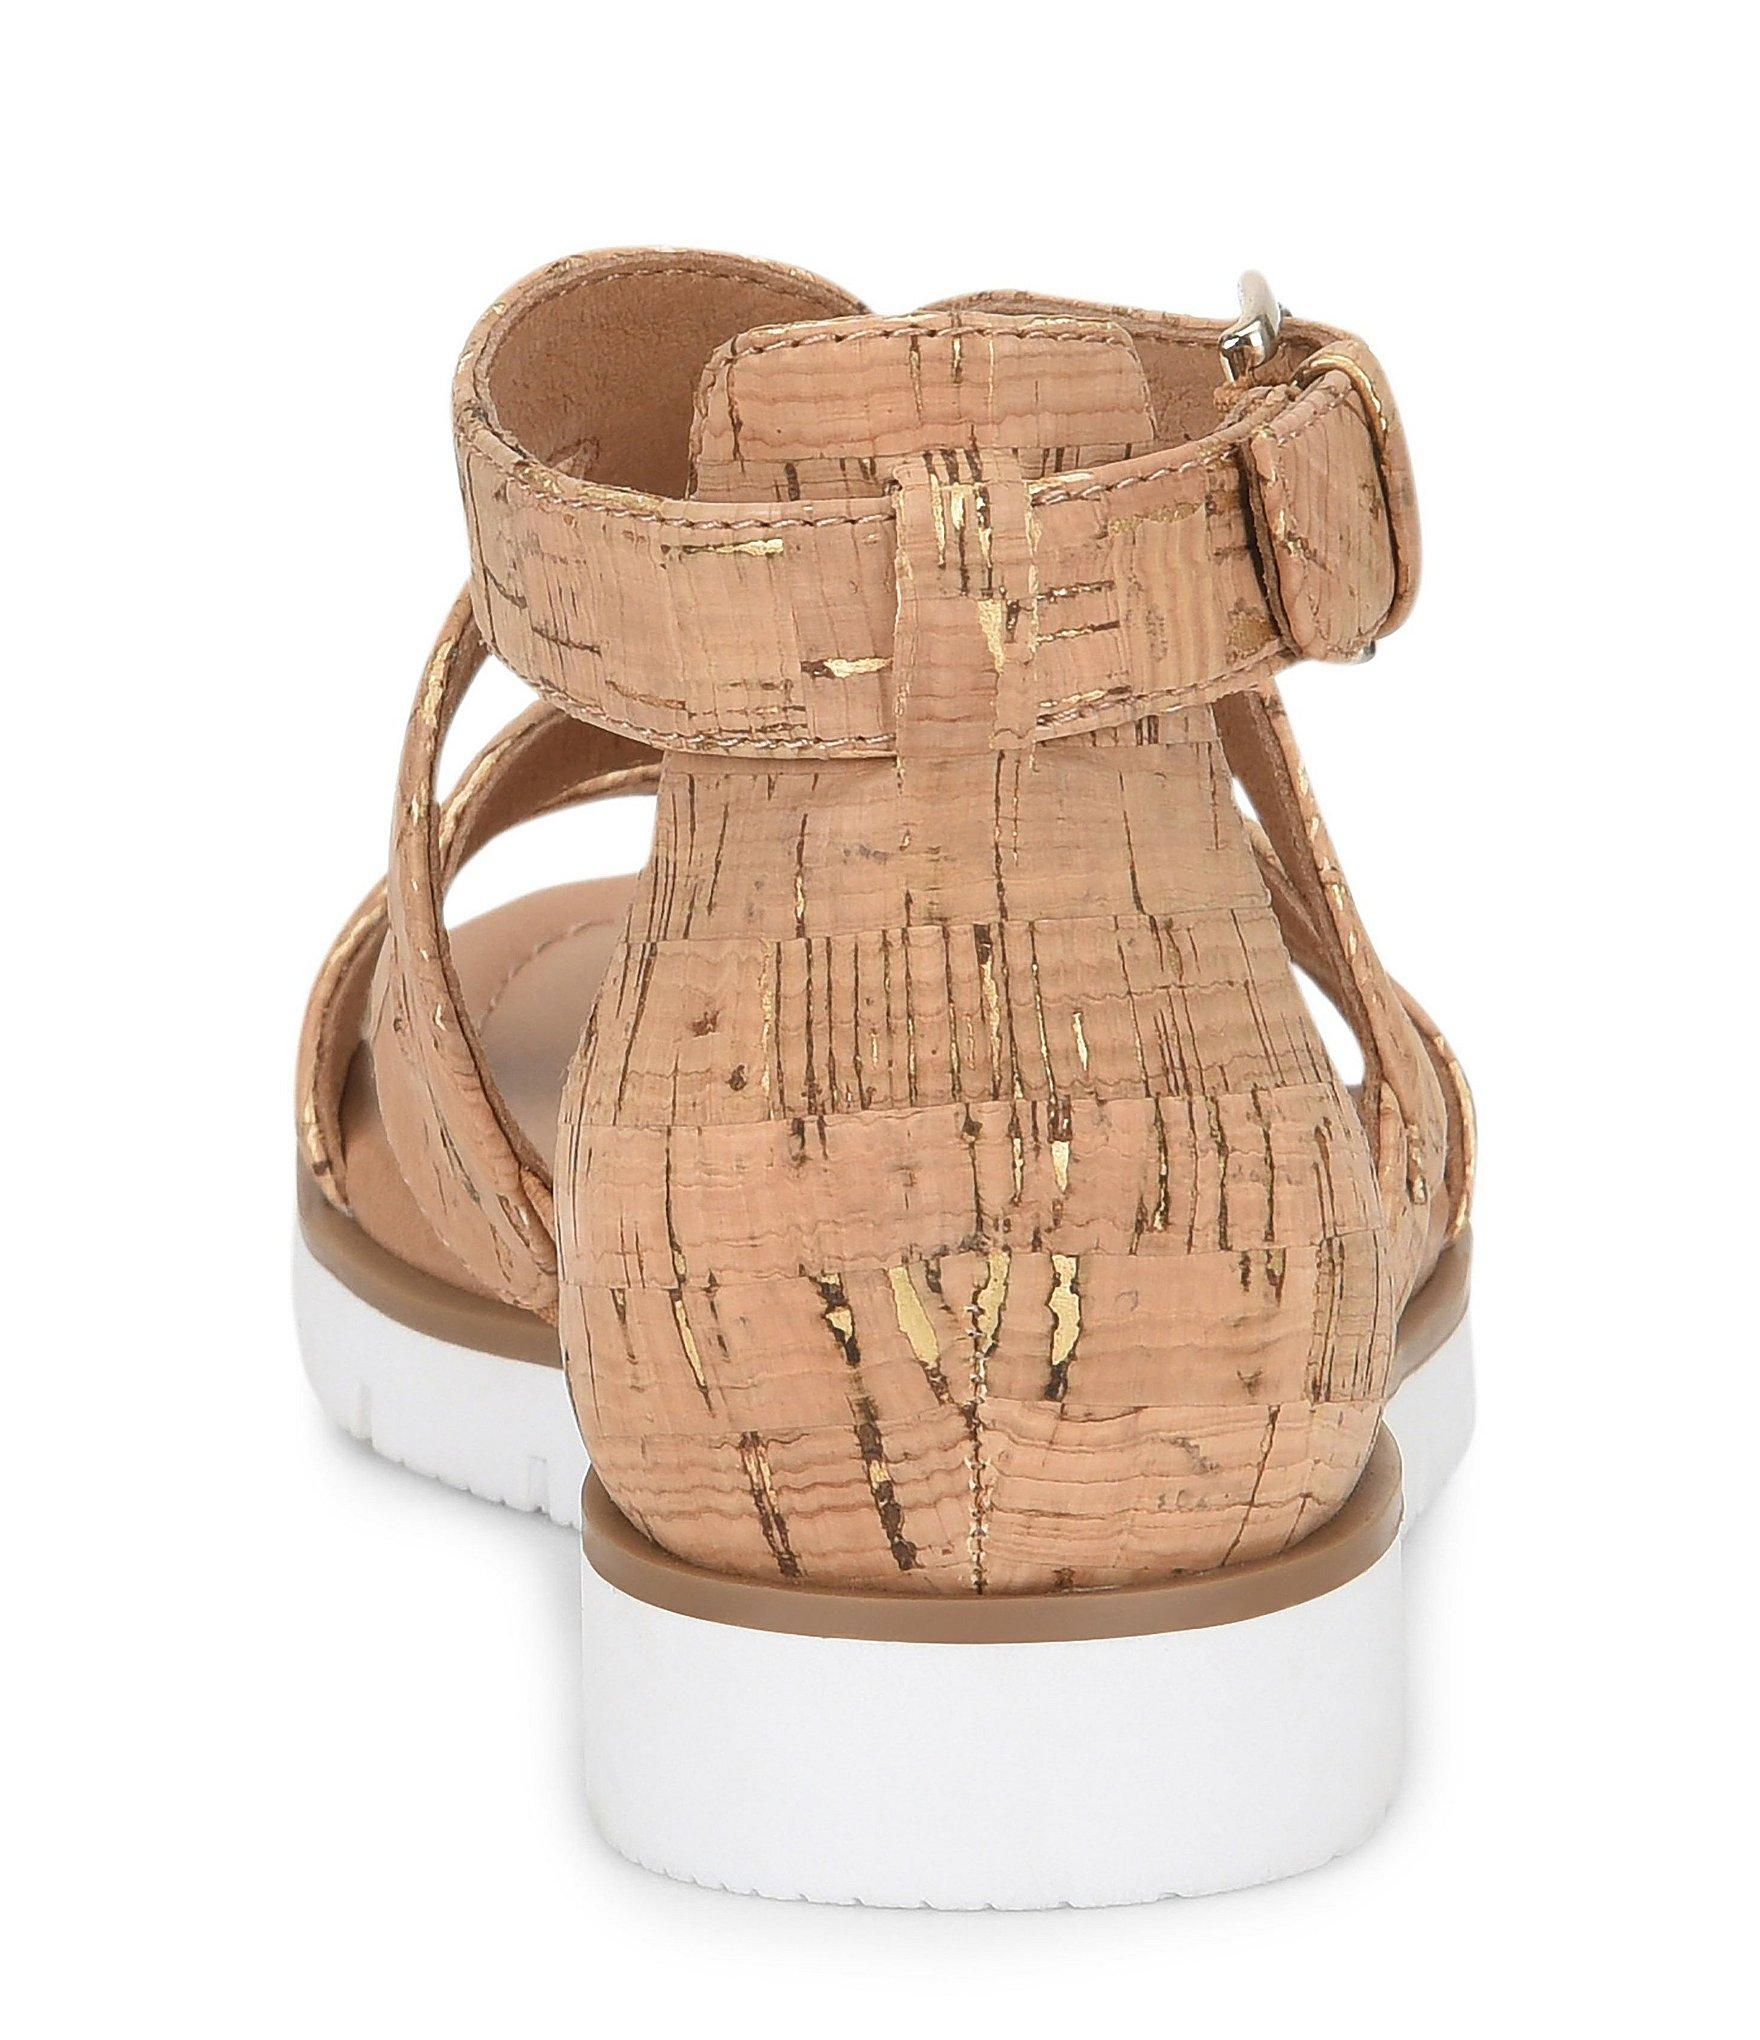 404e85f0326 Lyst - Söfft Malana Cork Sport Wedge Sandal in Brown